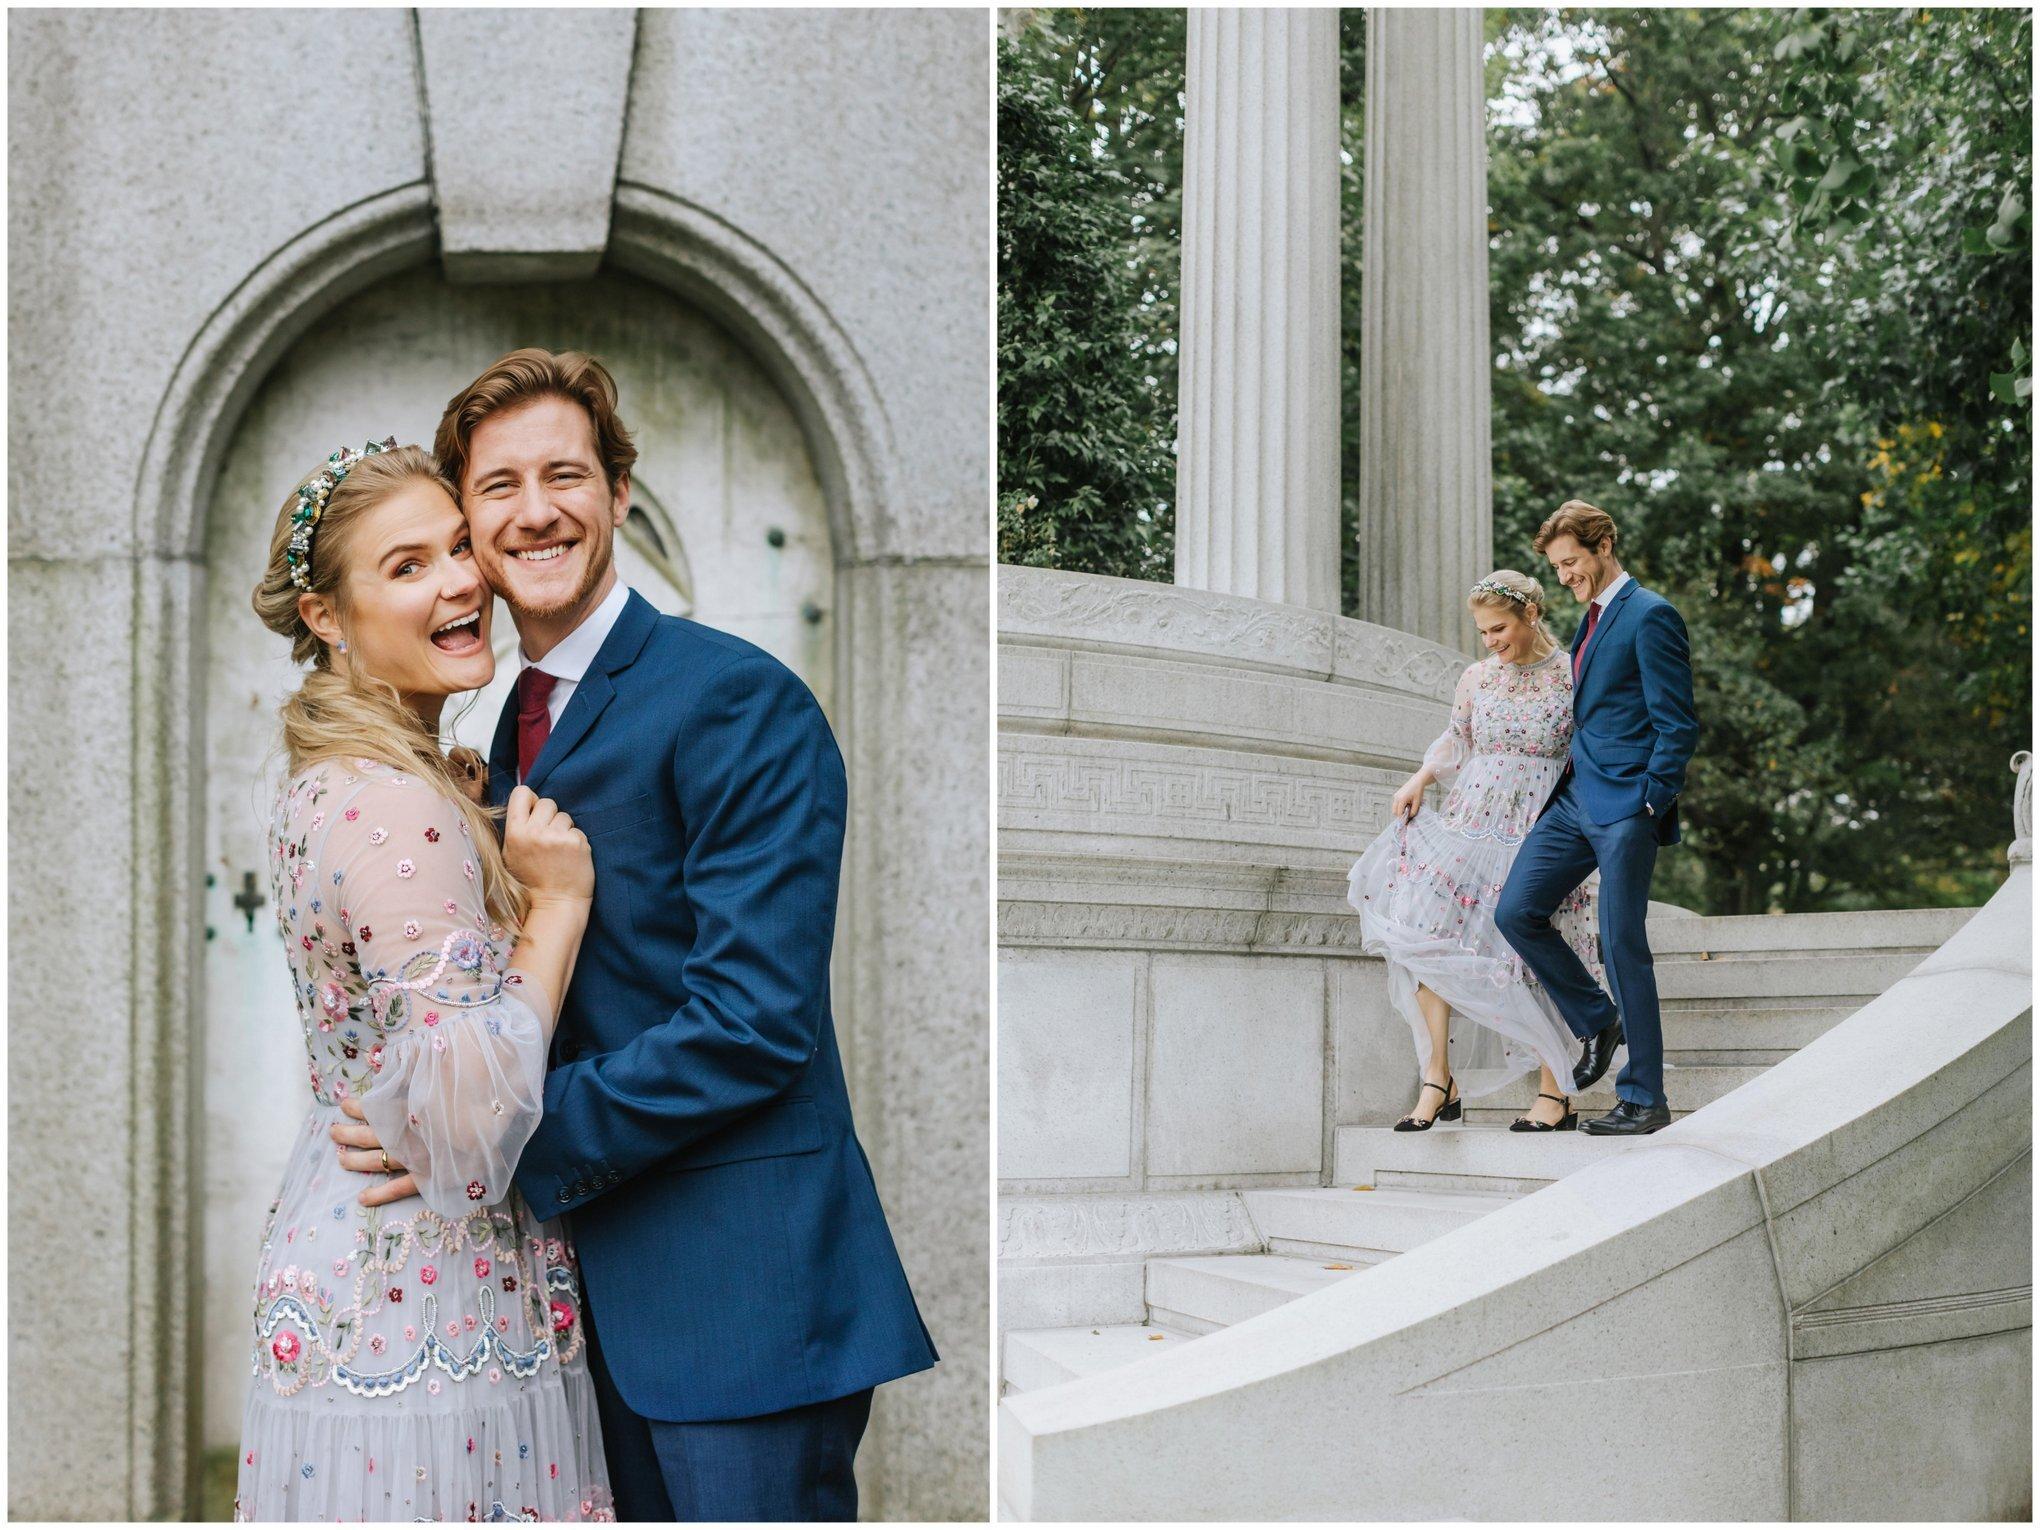 Cambridge-City-Hall-Wedding-Photographer-012.JPG